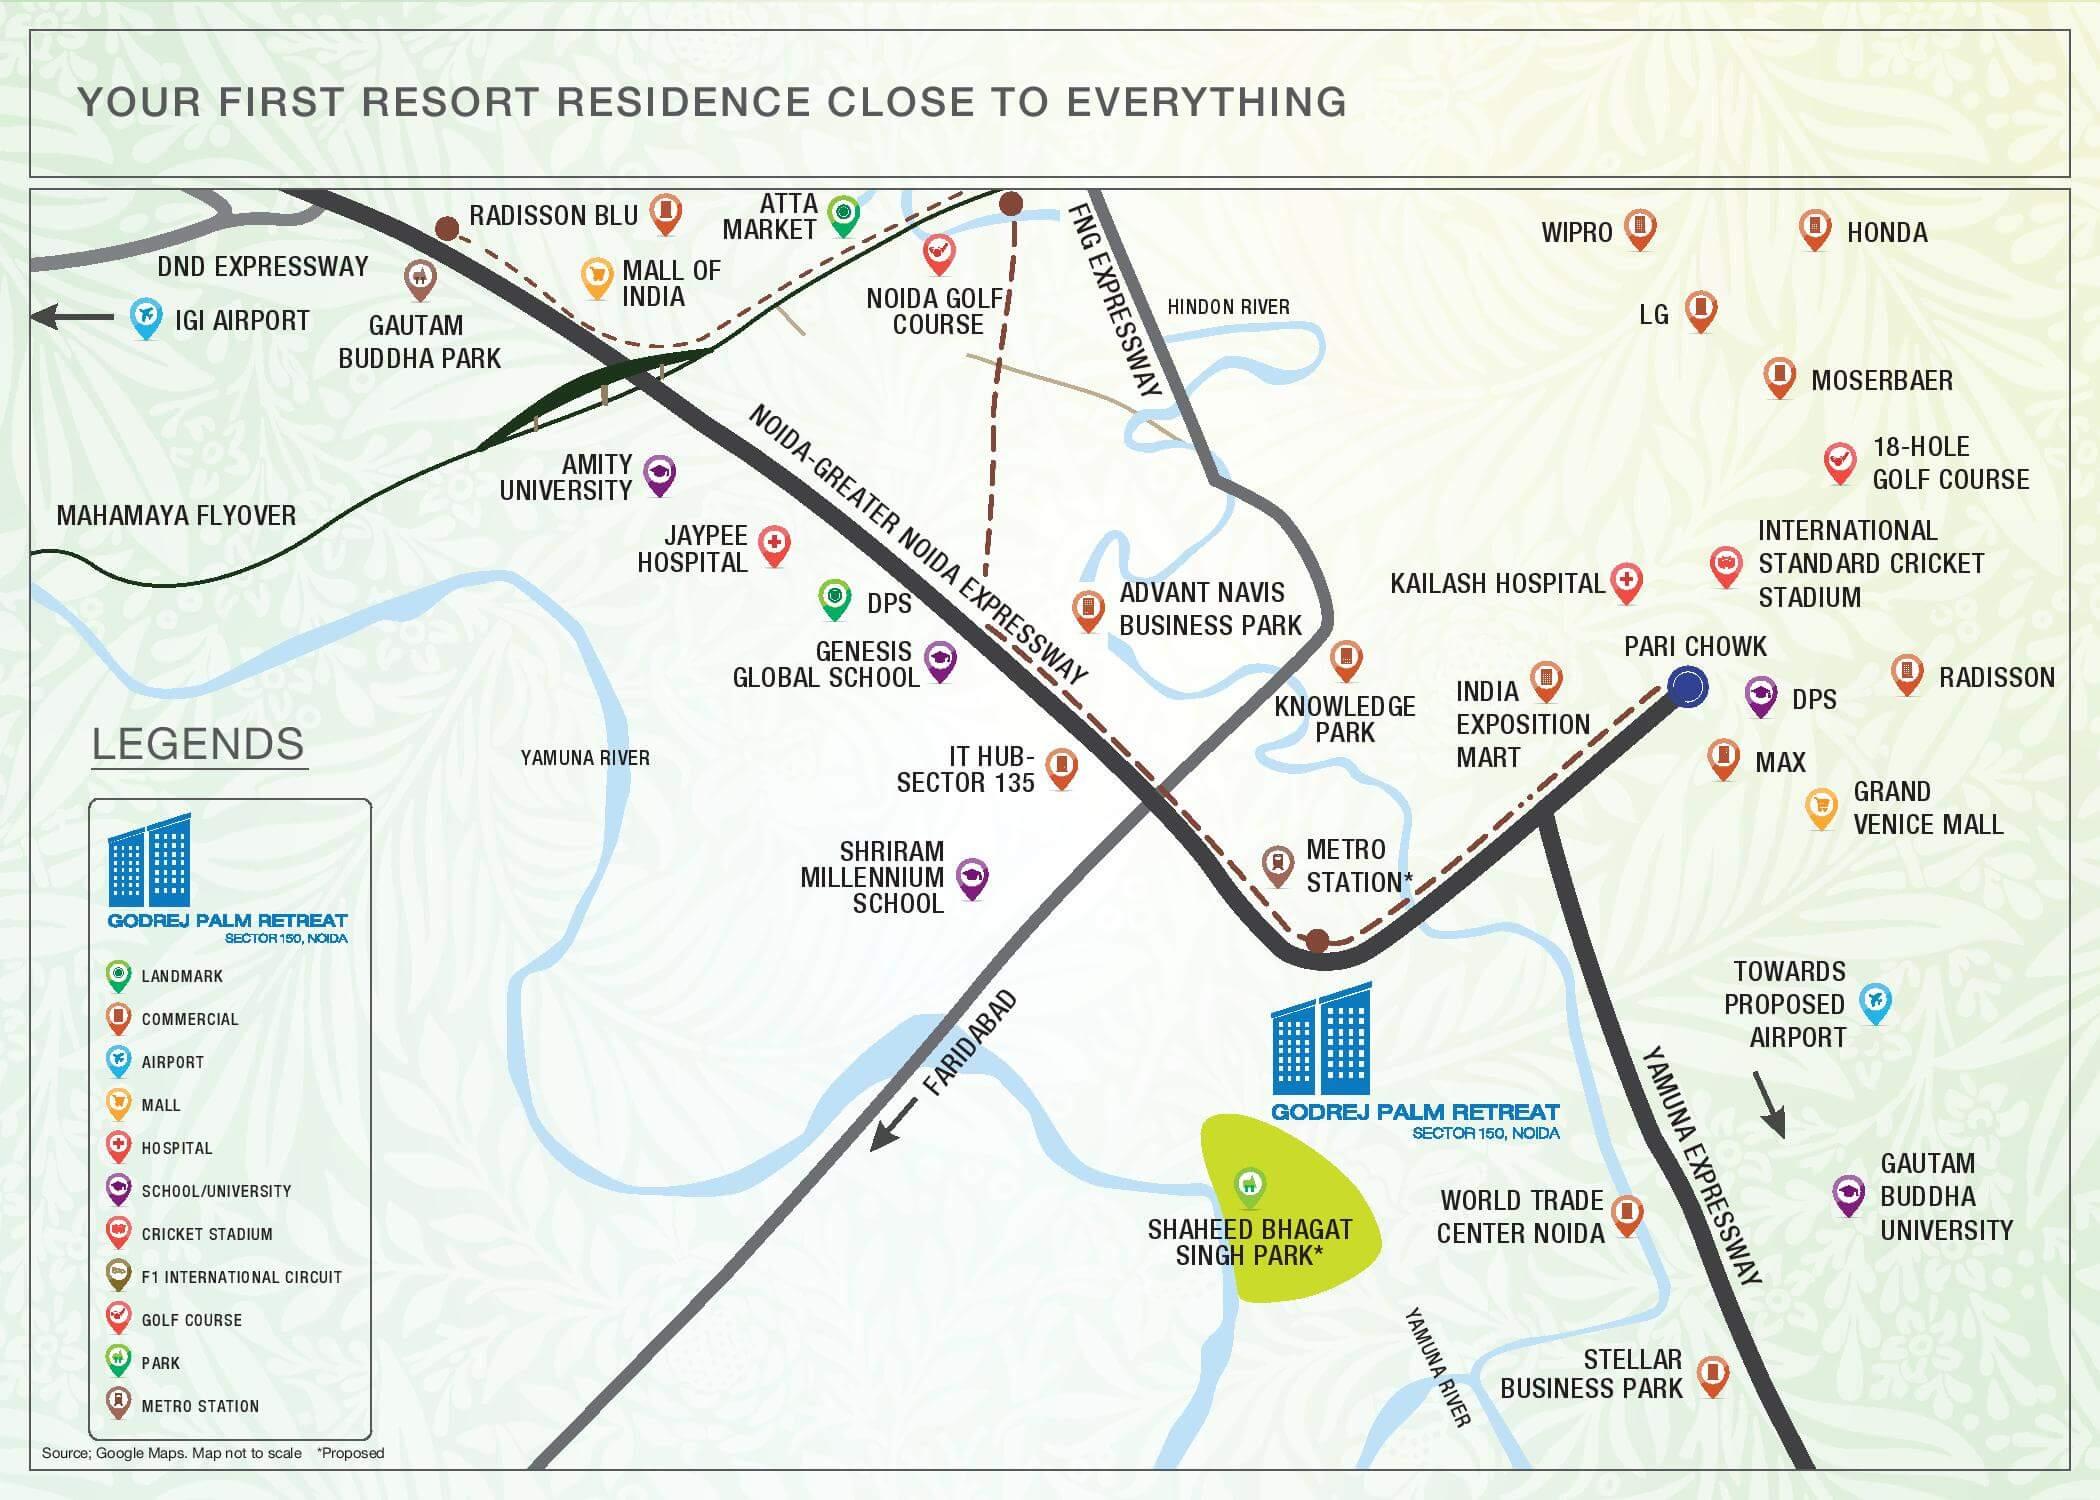 Godrej Palm Retreat Location Map